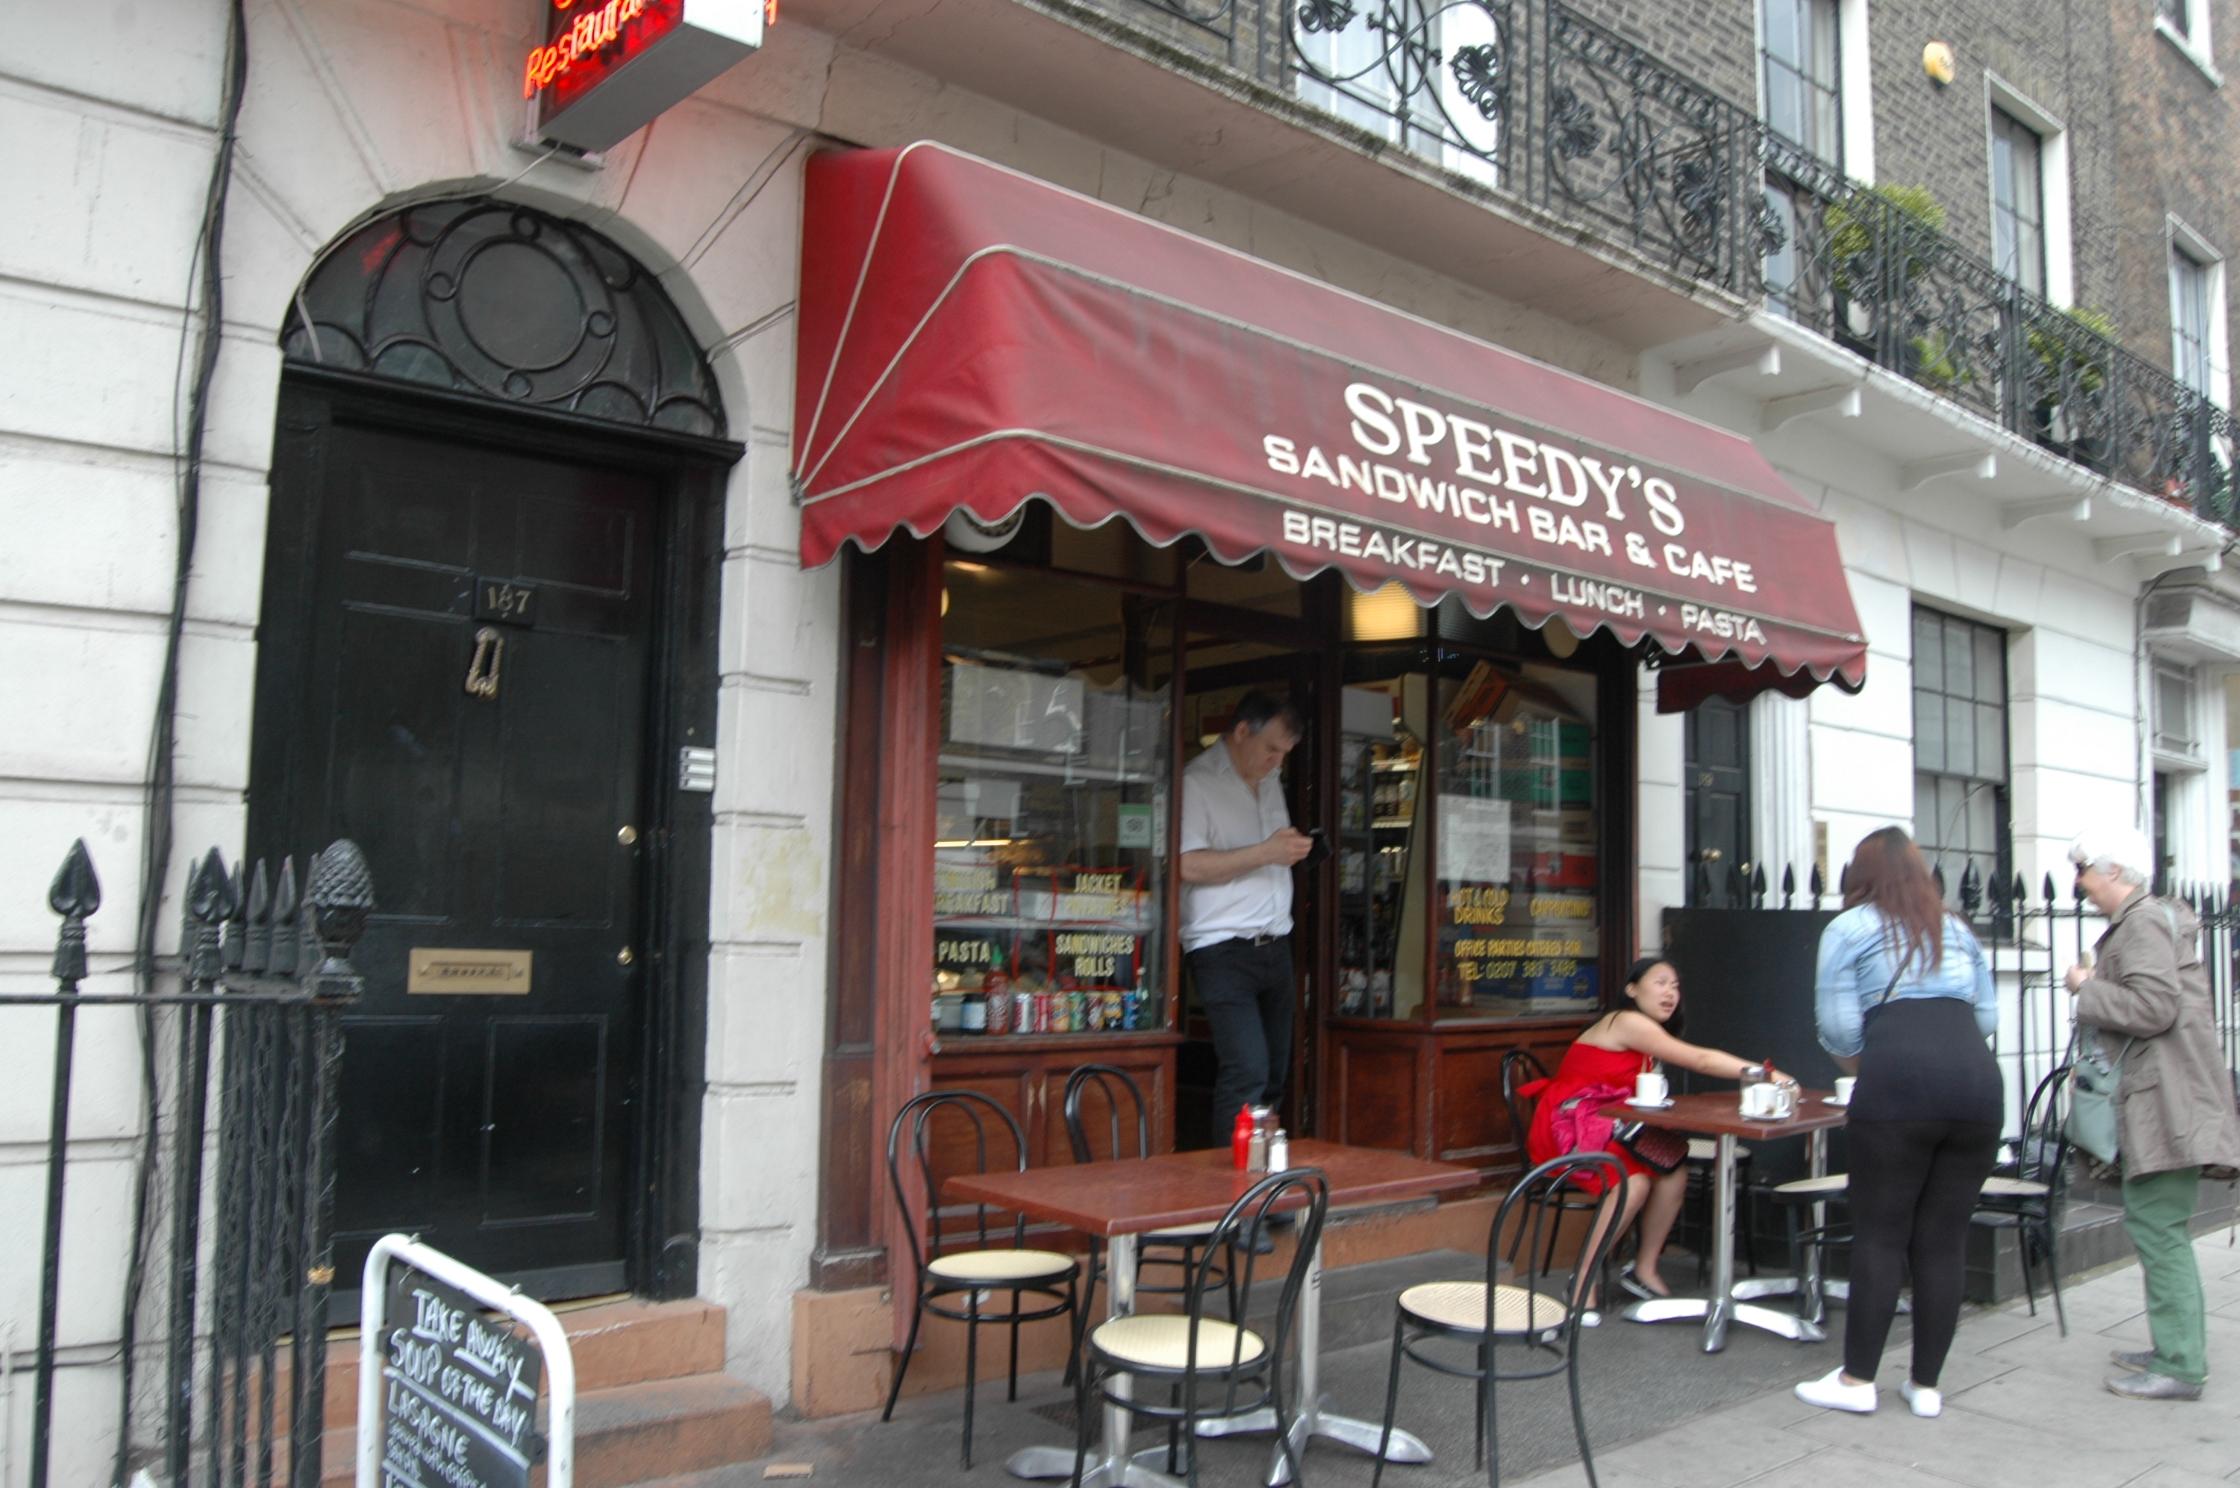 221b Baker Street Address Known as 221b Baker Street